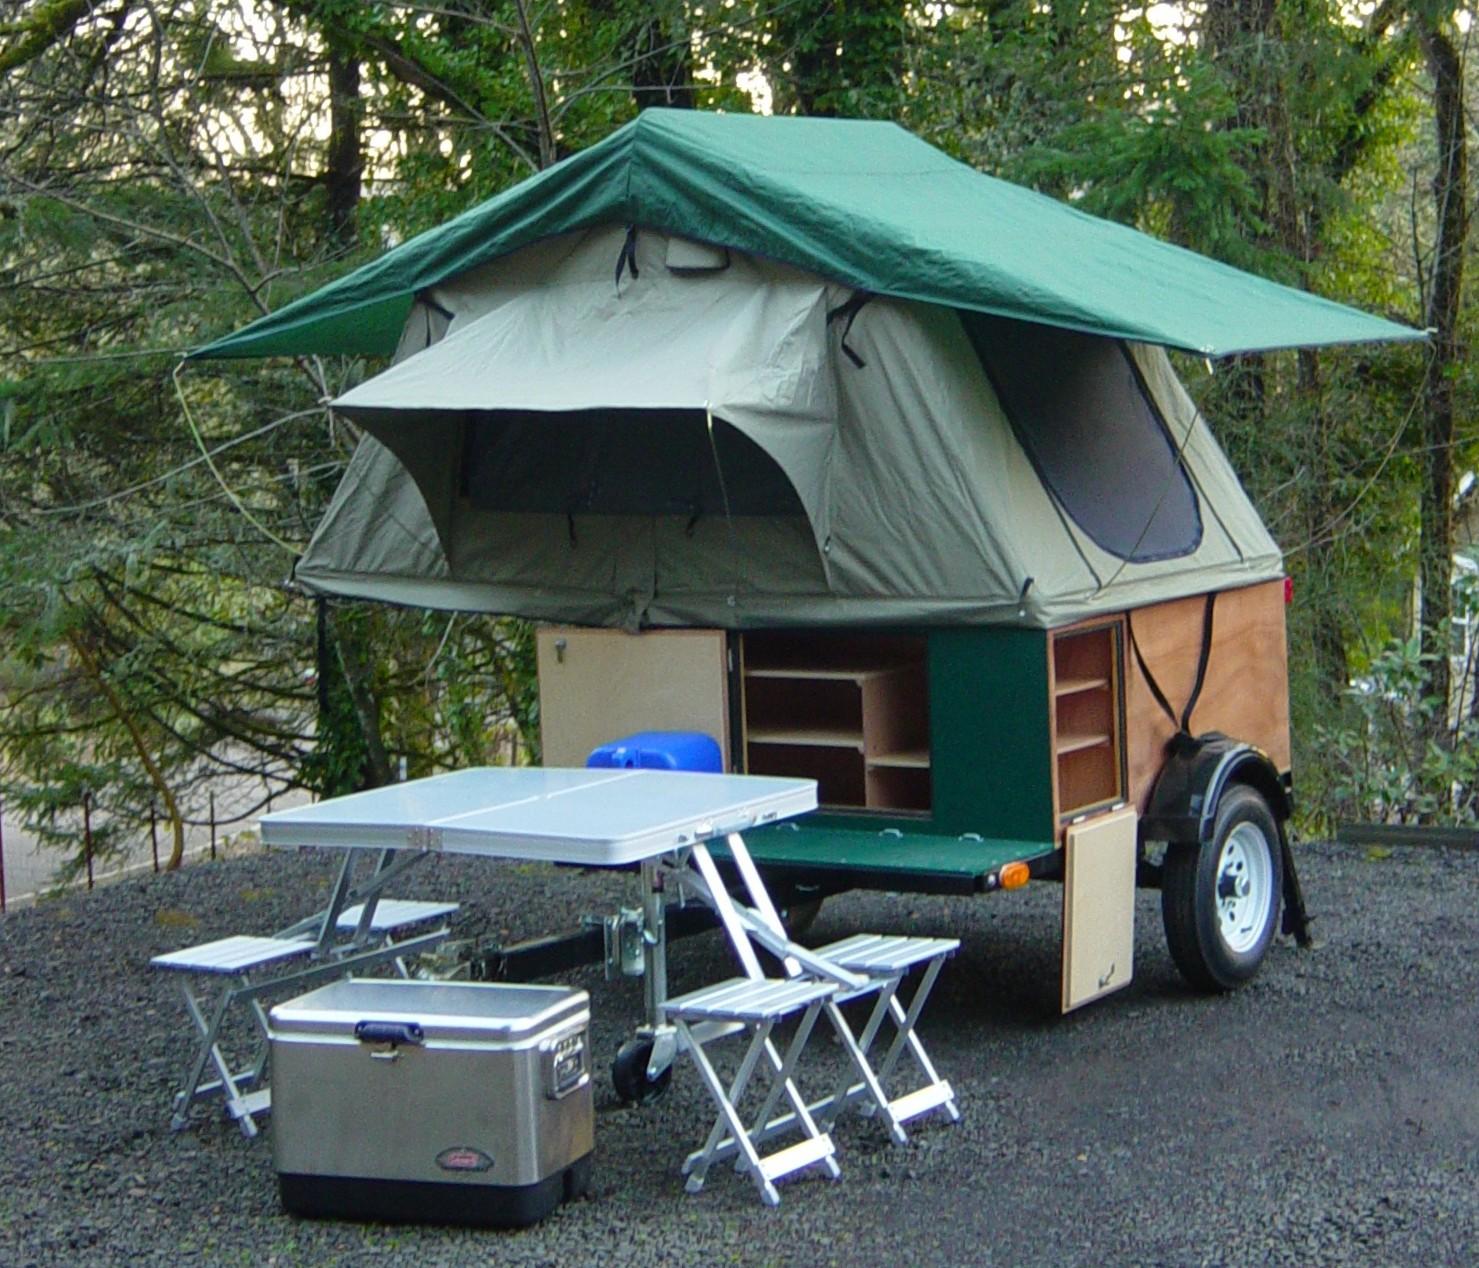 Diy Explorer Box Camping Trailer Compact Camping Concepts